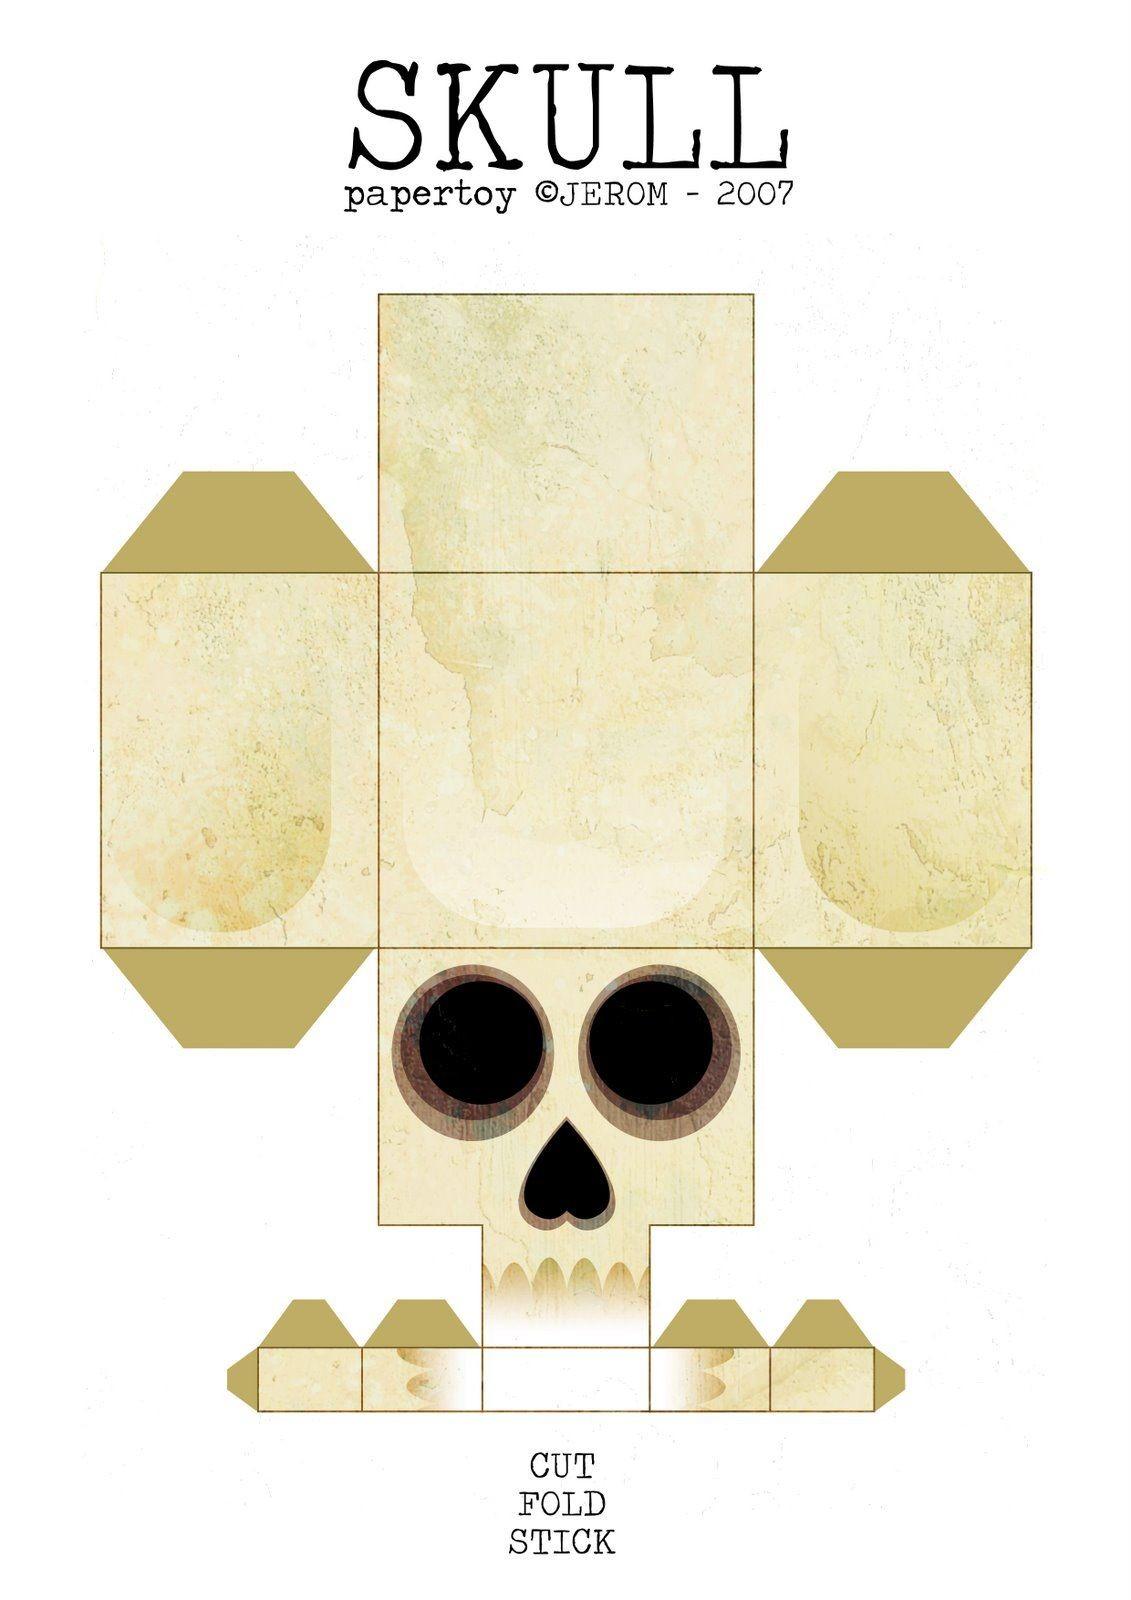 Papercraft Skeleton Jb8ha9cuj44 Tnzz01g0xvi Aaaaaaaaaws 7nkxxe